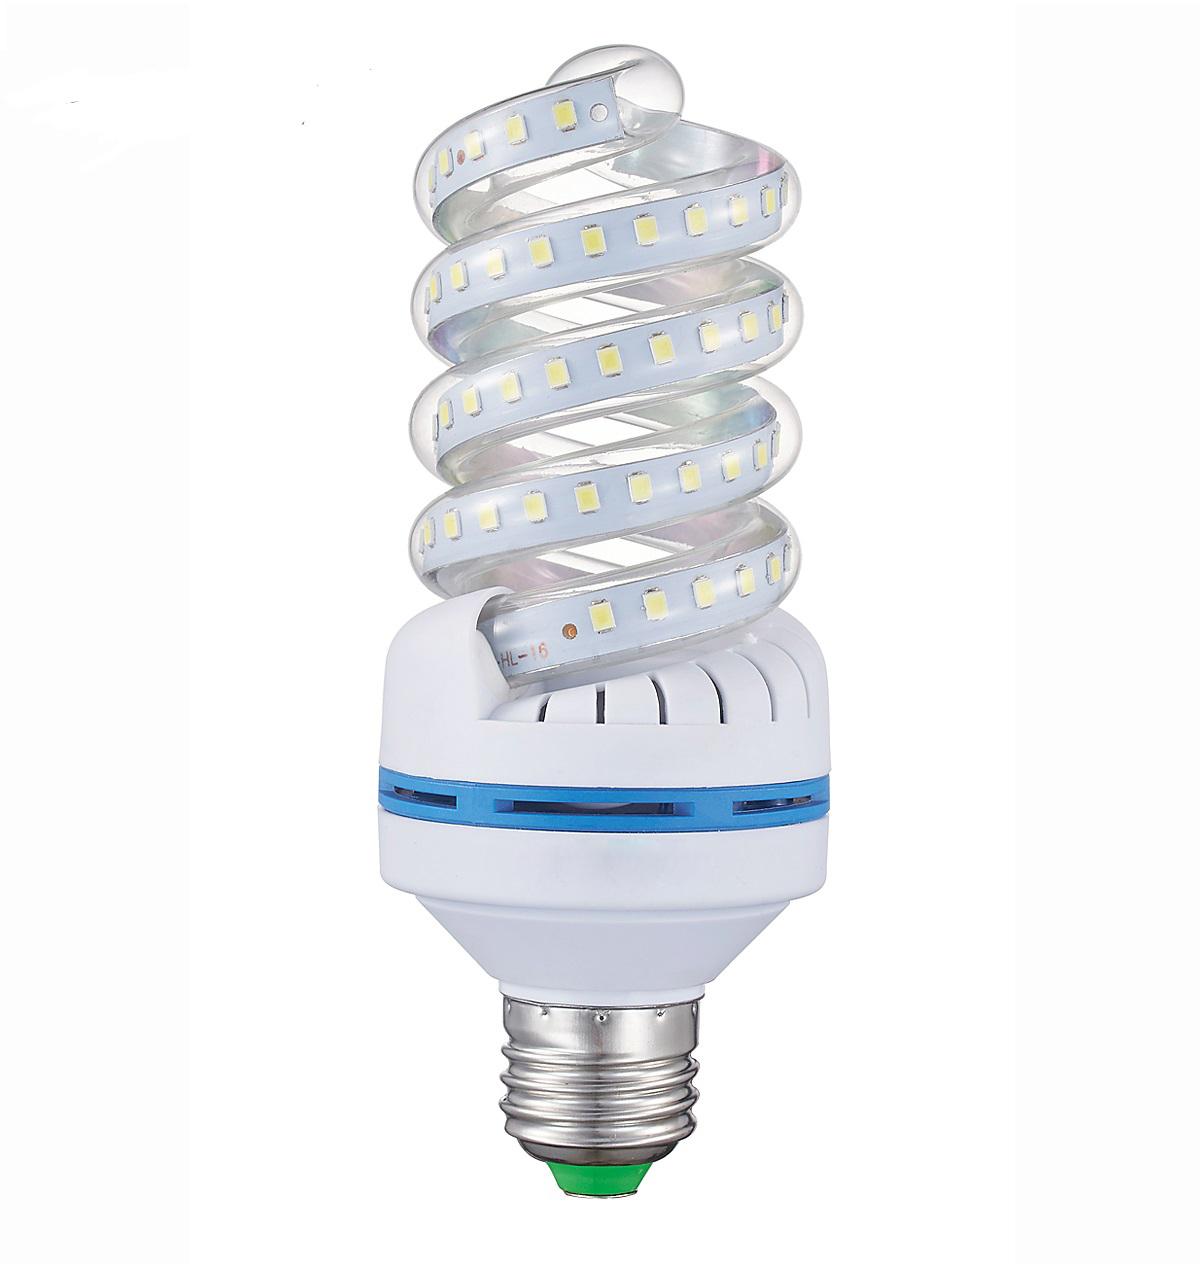 15W SPIRAL led corn light bulb